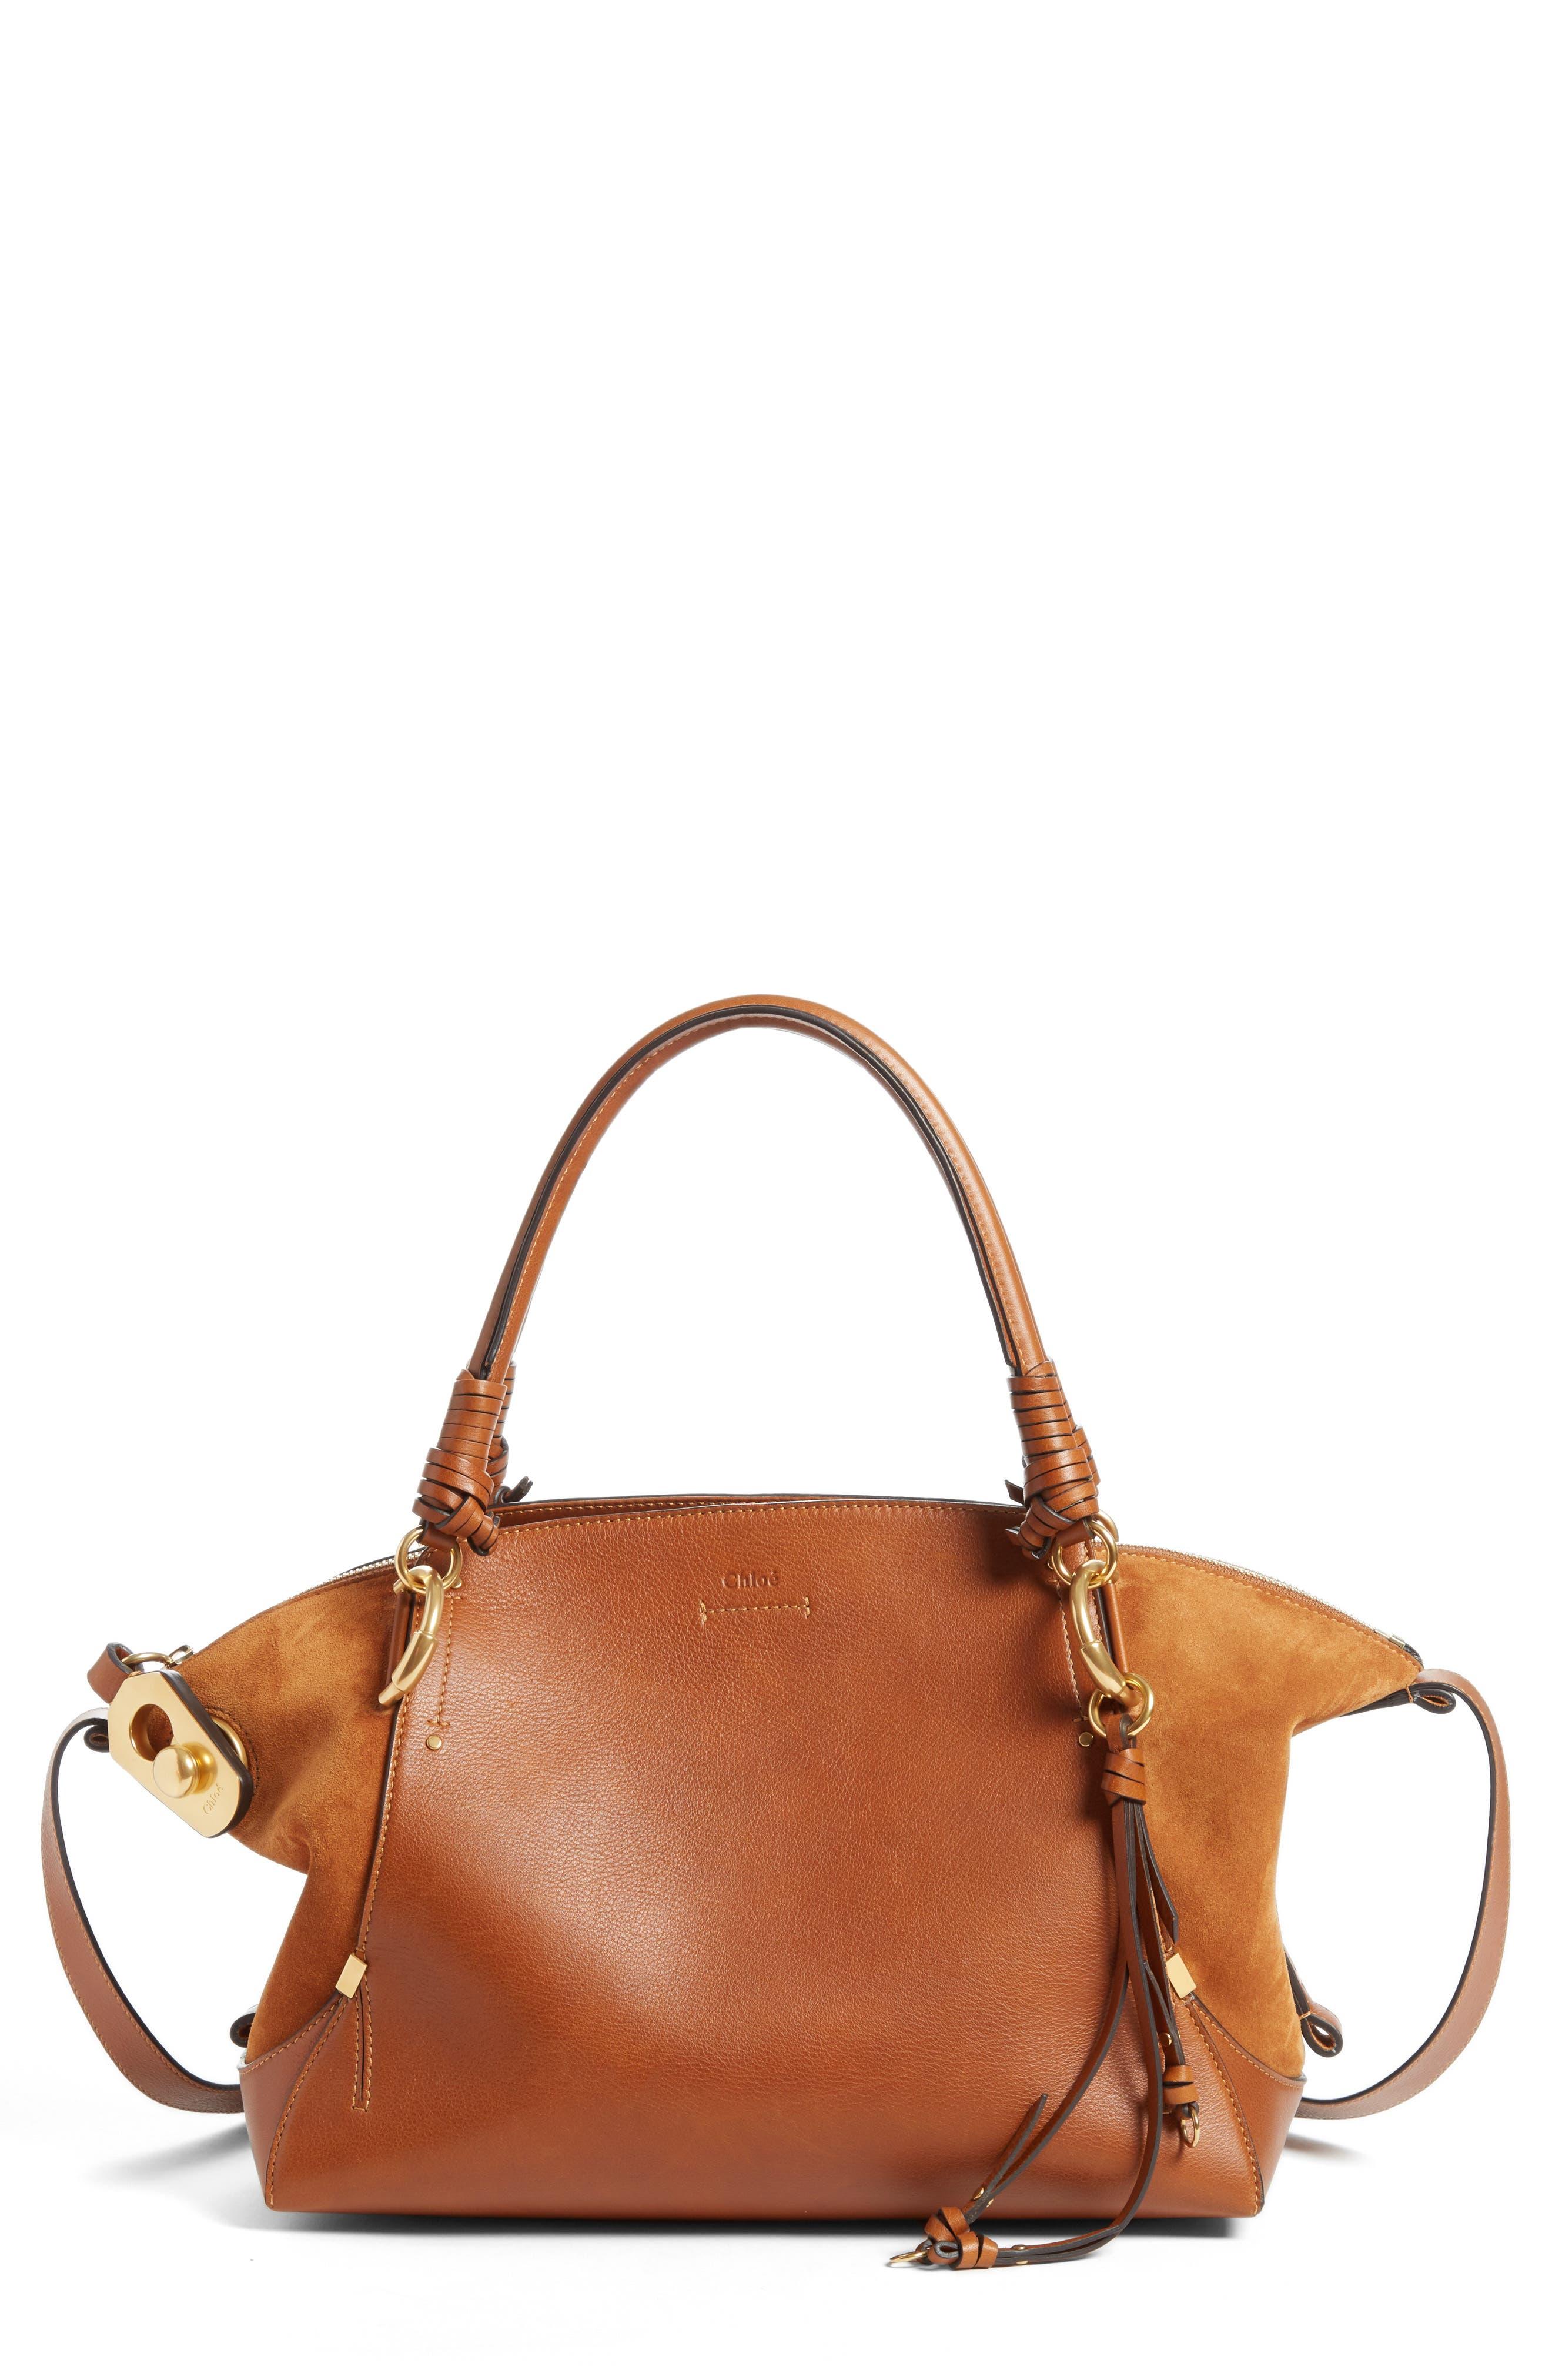 Chloé Medium Owen Calfskin Leather Tote